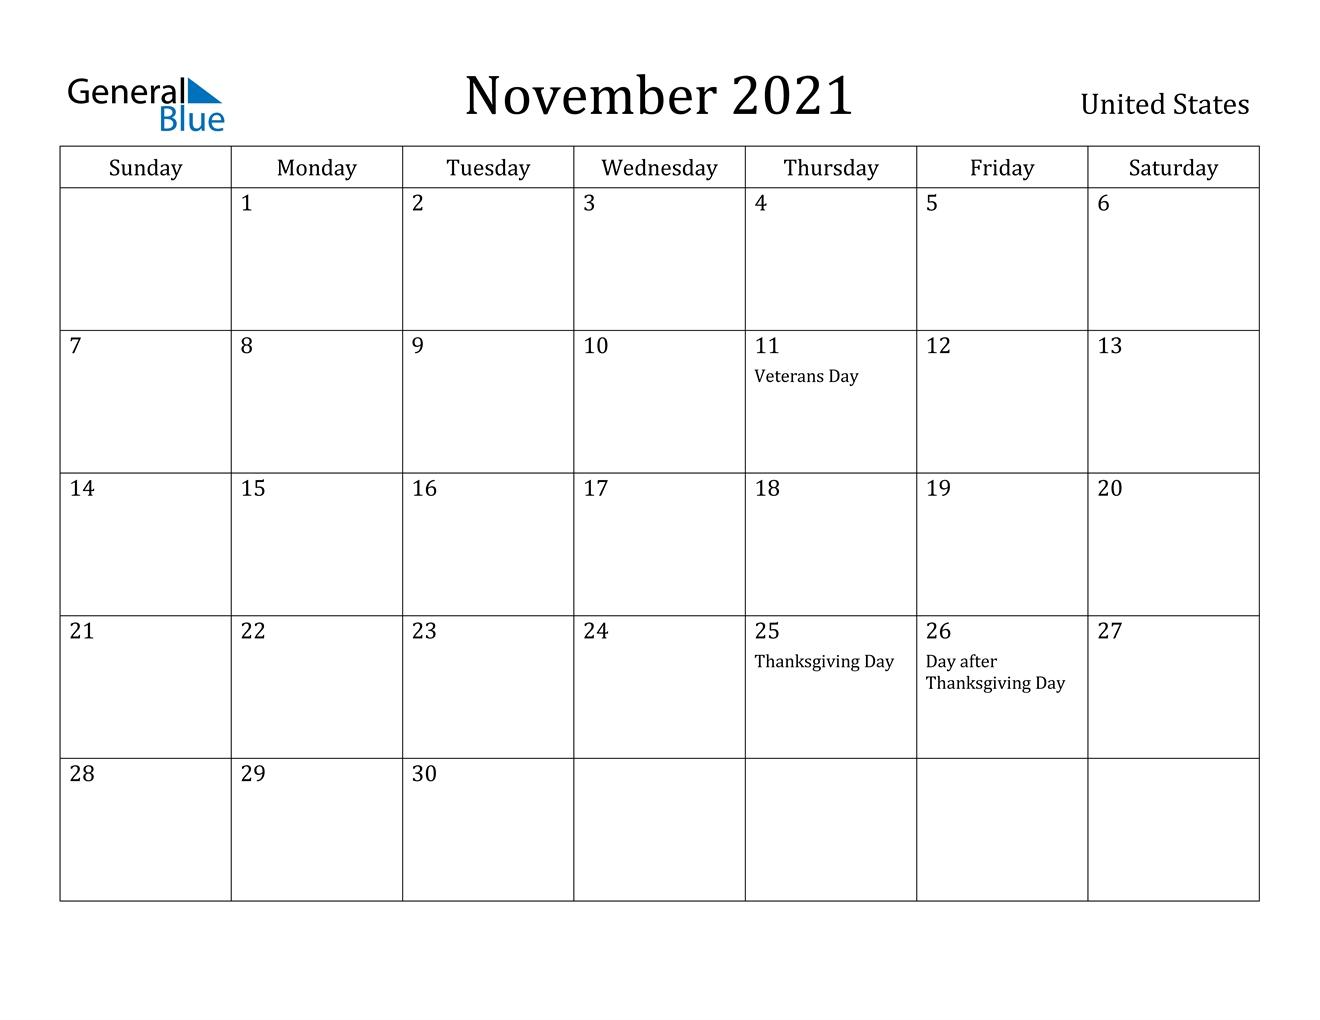 Take November 2021 Calendar With Holidays